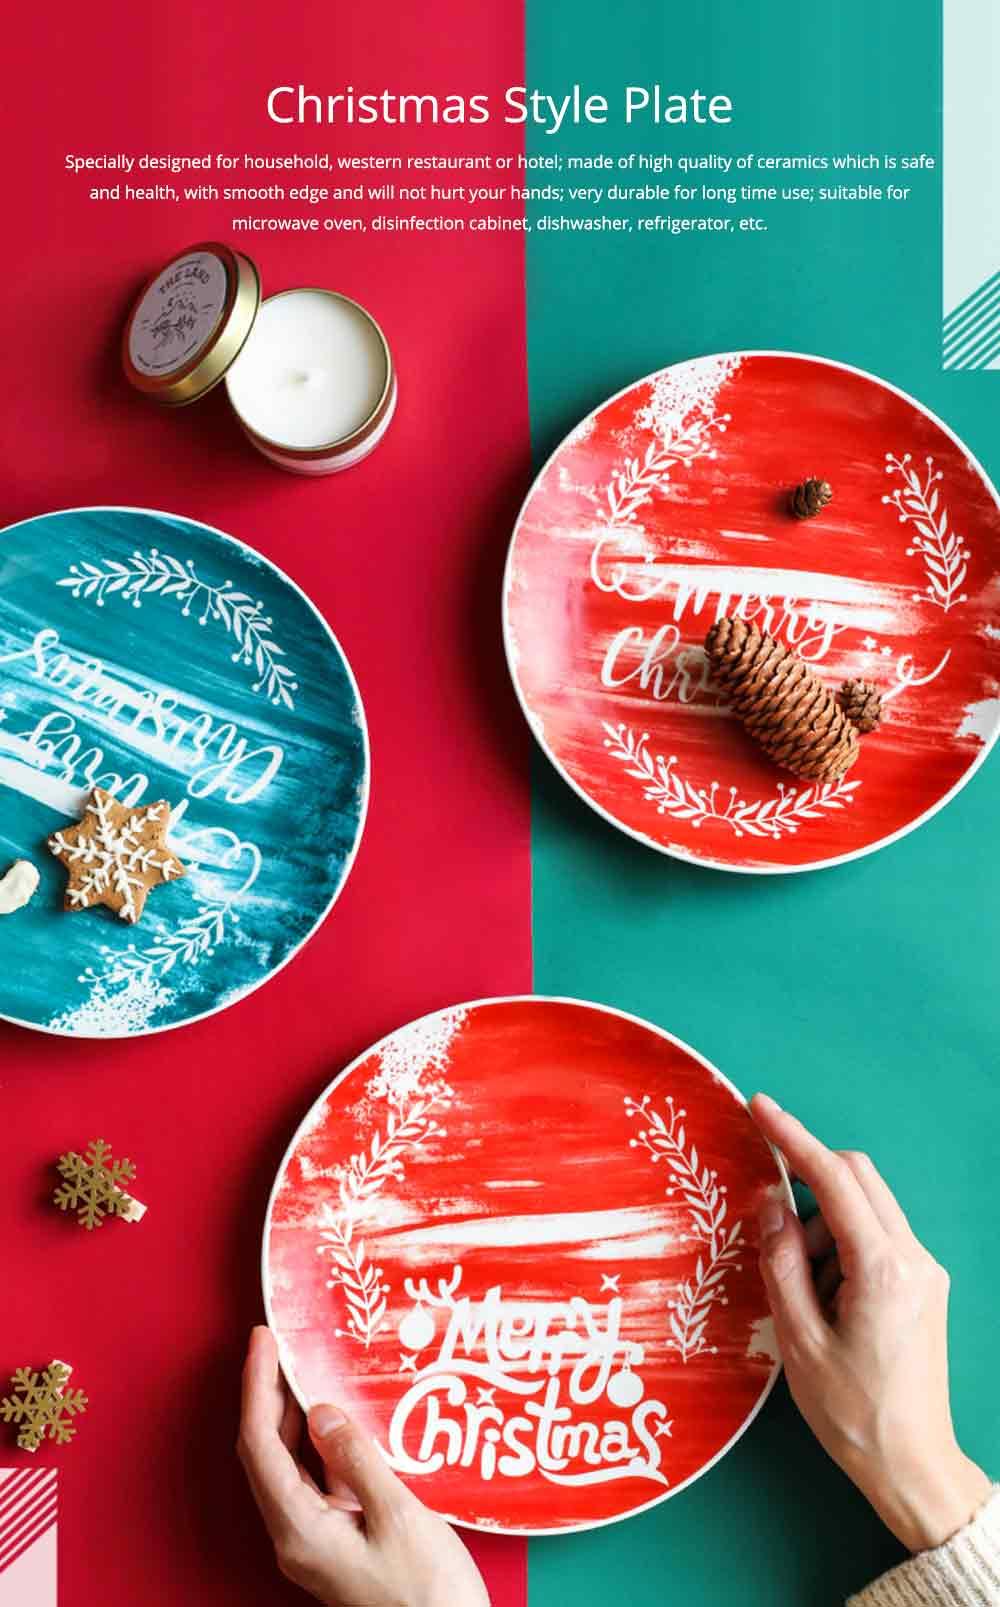 Christmas Painted Ceramic Plates, Christmas Style Steak Dinner Plates 0